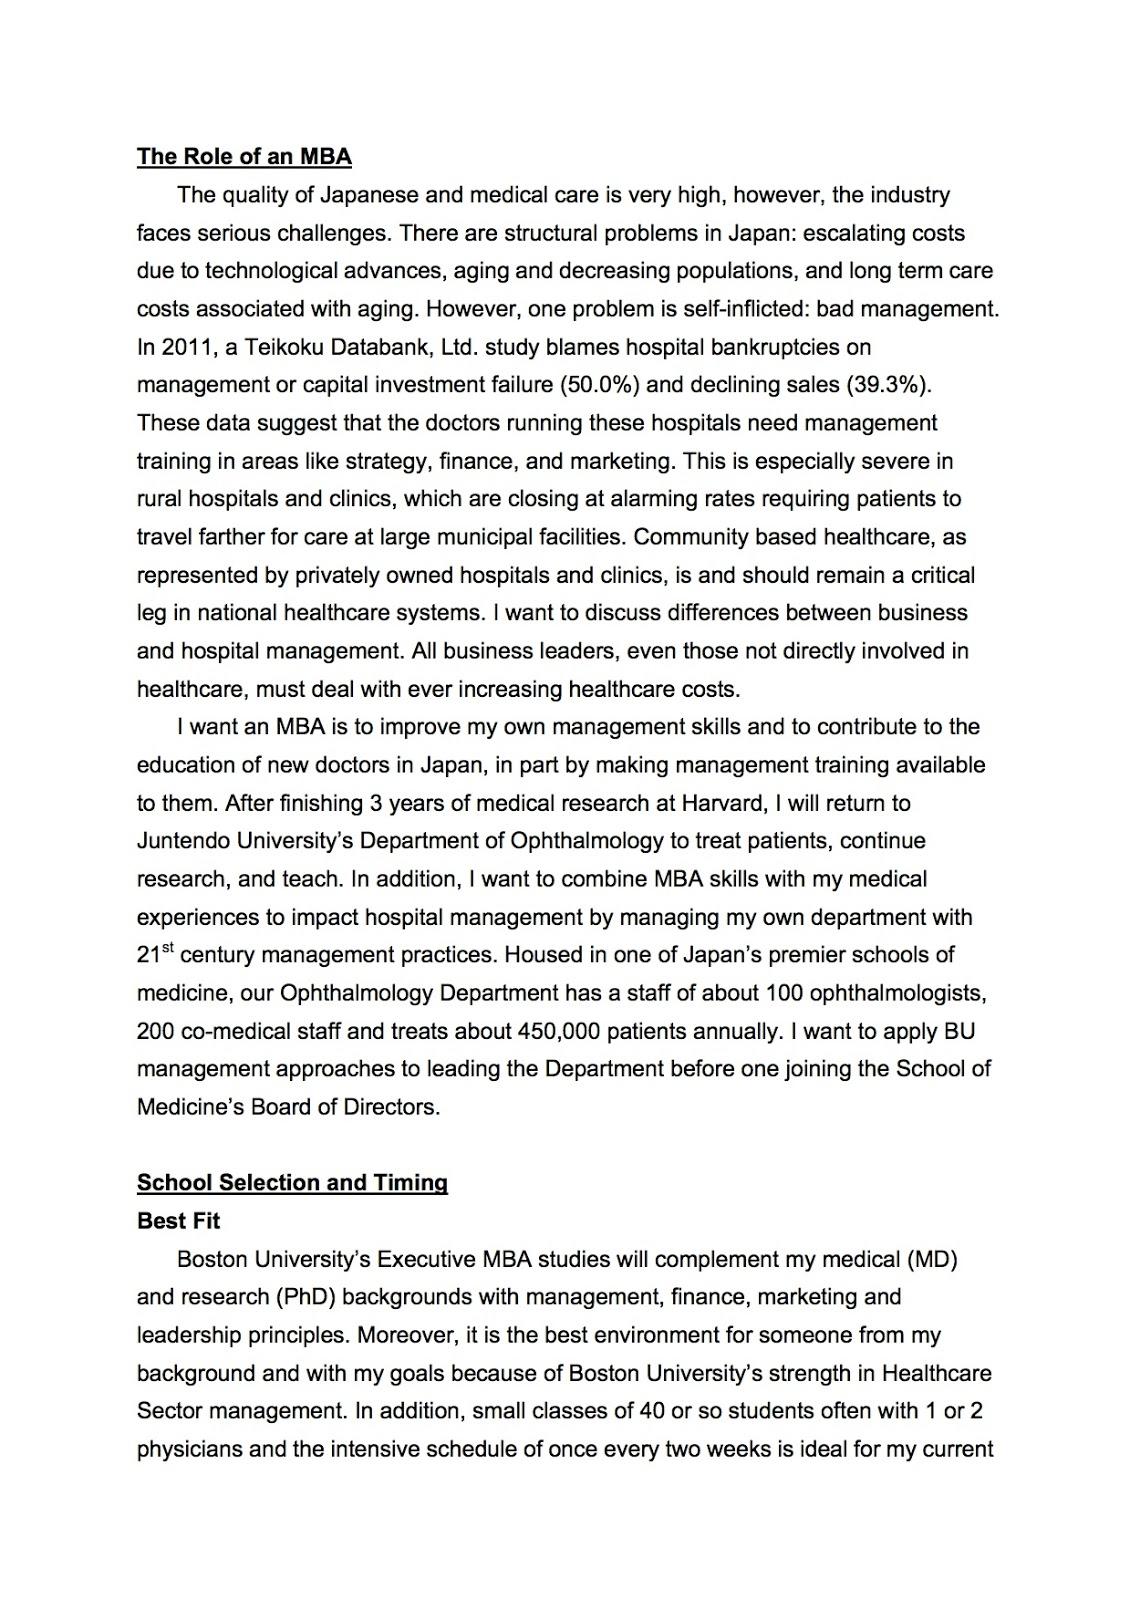 villanova essay site college admission essay com villanova sample  emba resume book coverletter writing example emba resume book villanova school of business of essay outline